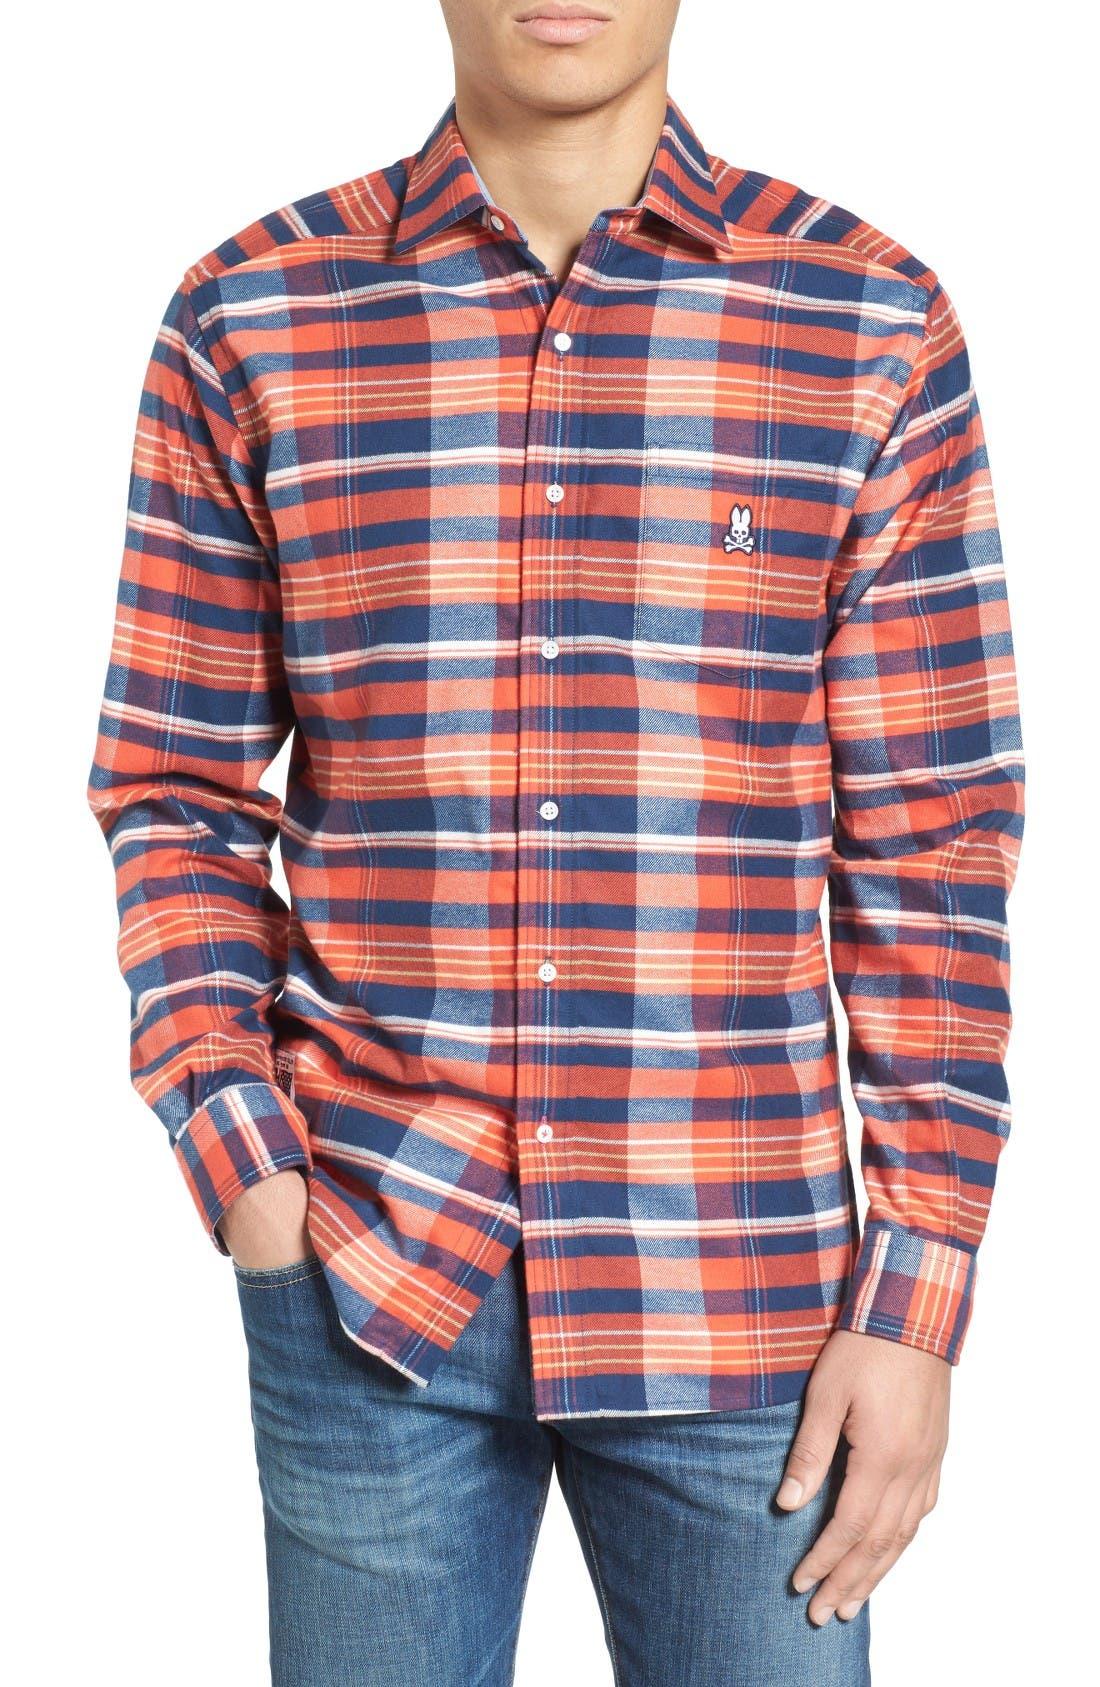 PSYCHO BUNNY Flannel Woven Shirt